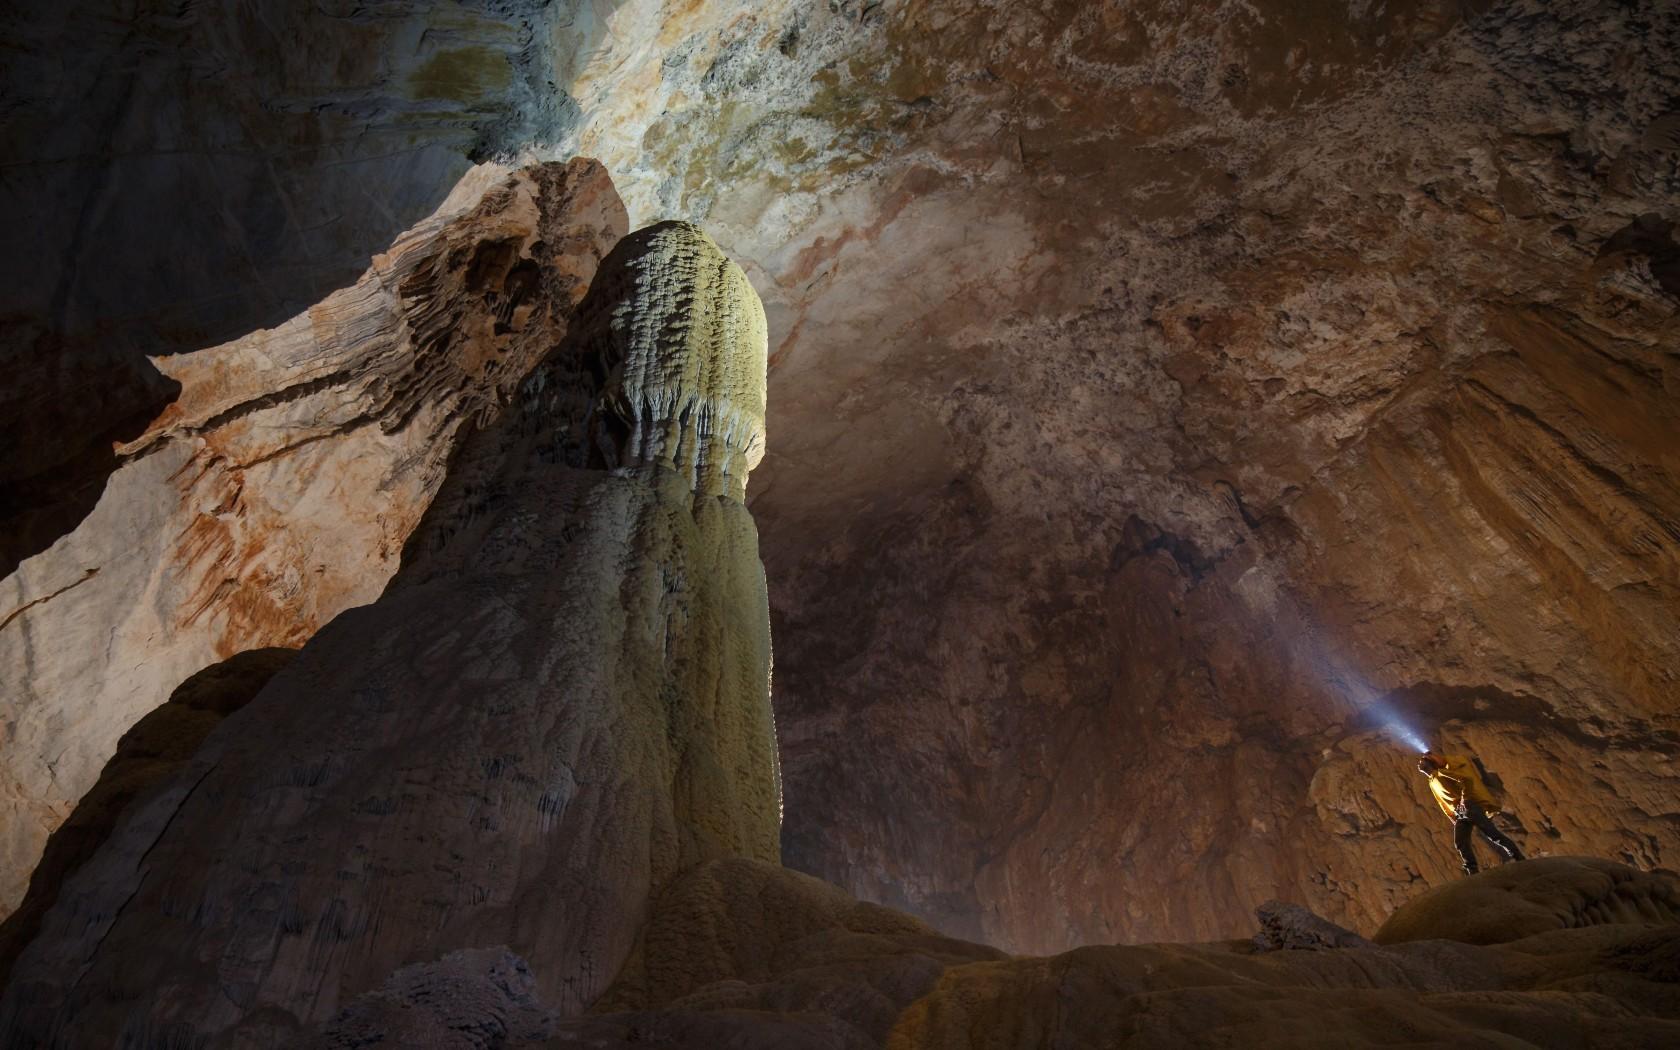 19Overs-Son-Doong-Cave-Vietnam-rexfeatures_3601504e-1680x1050